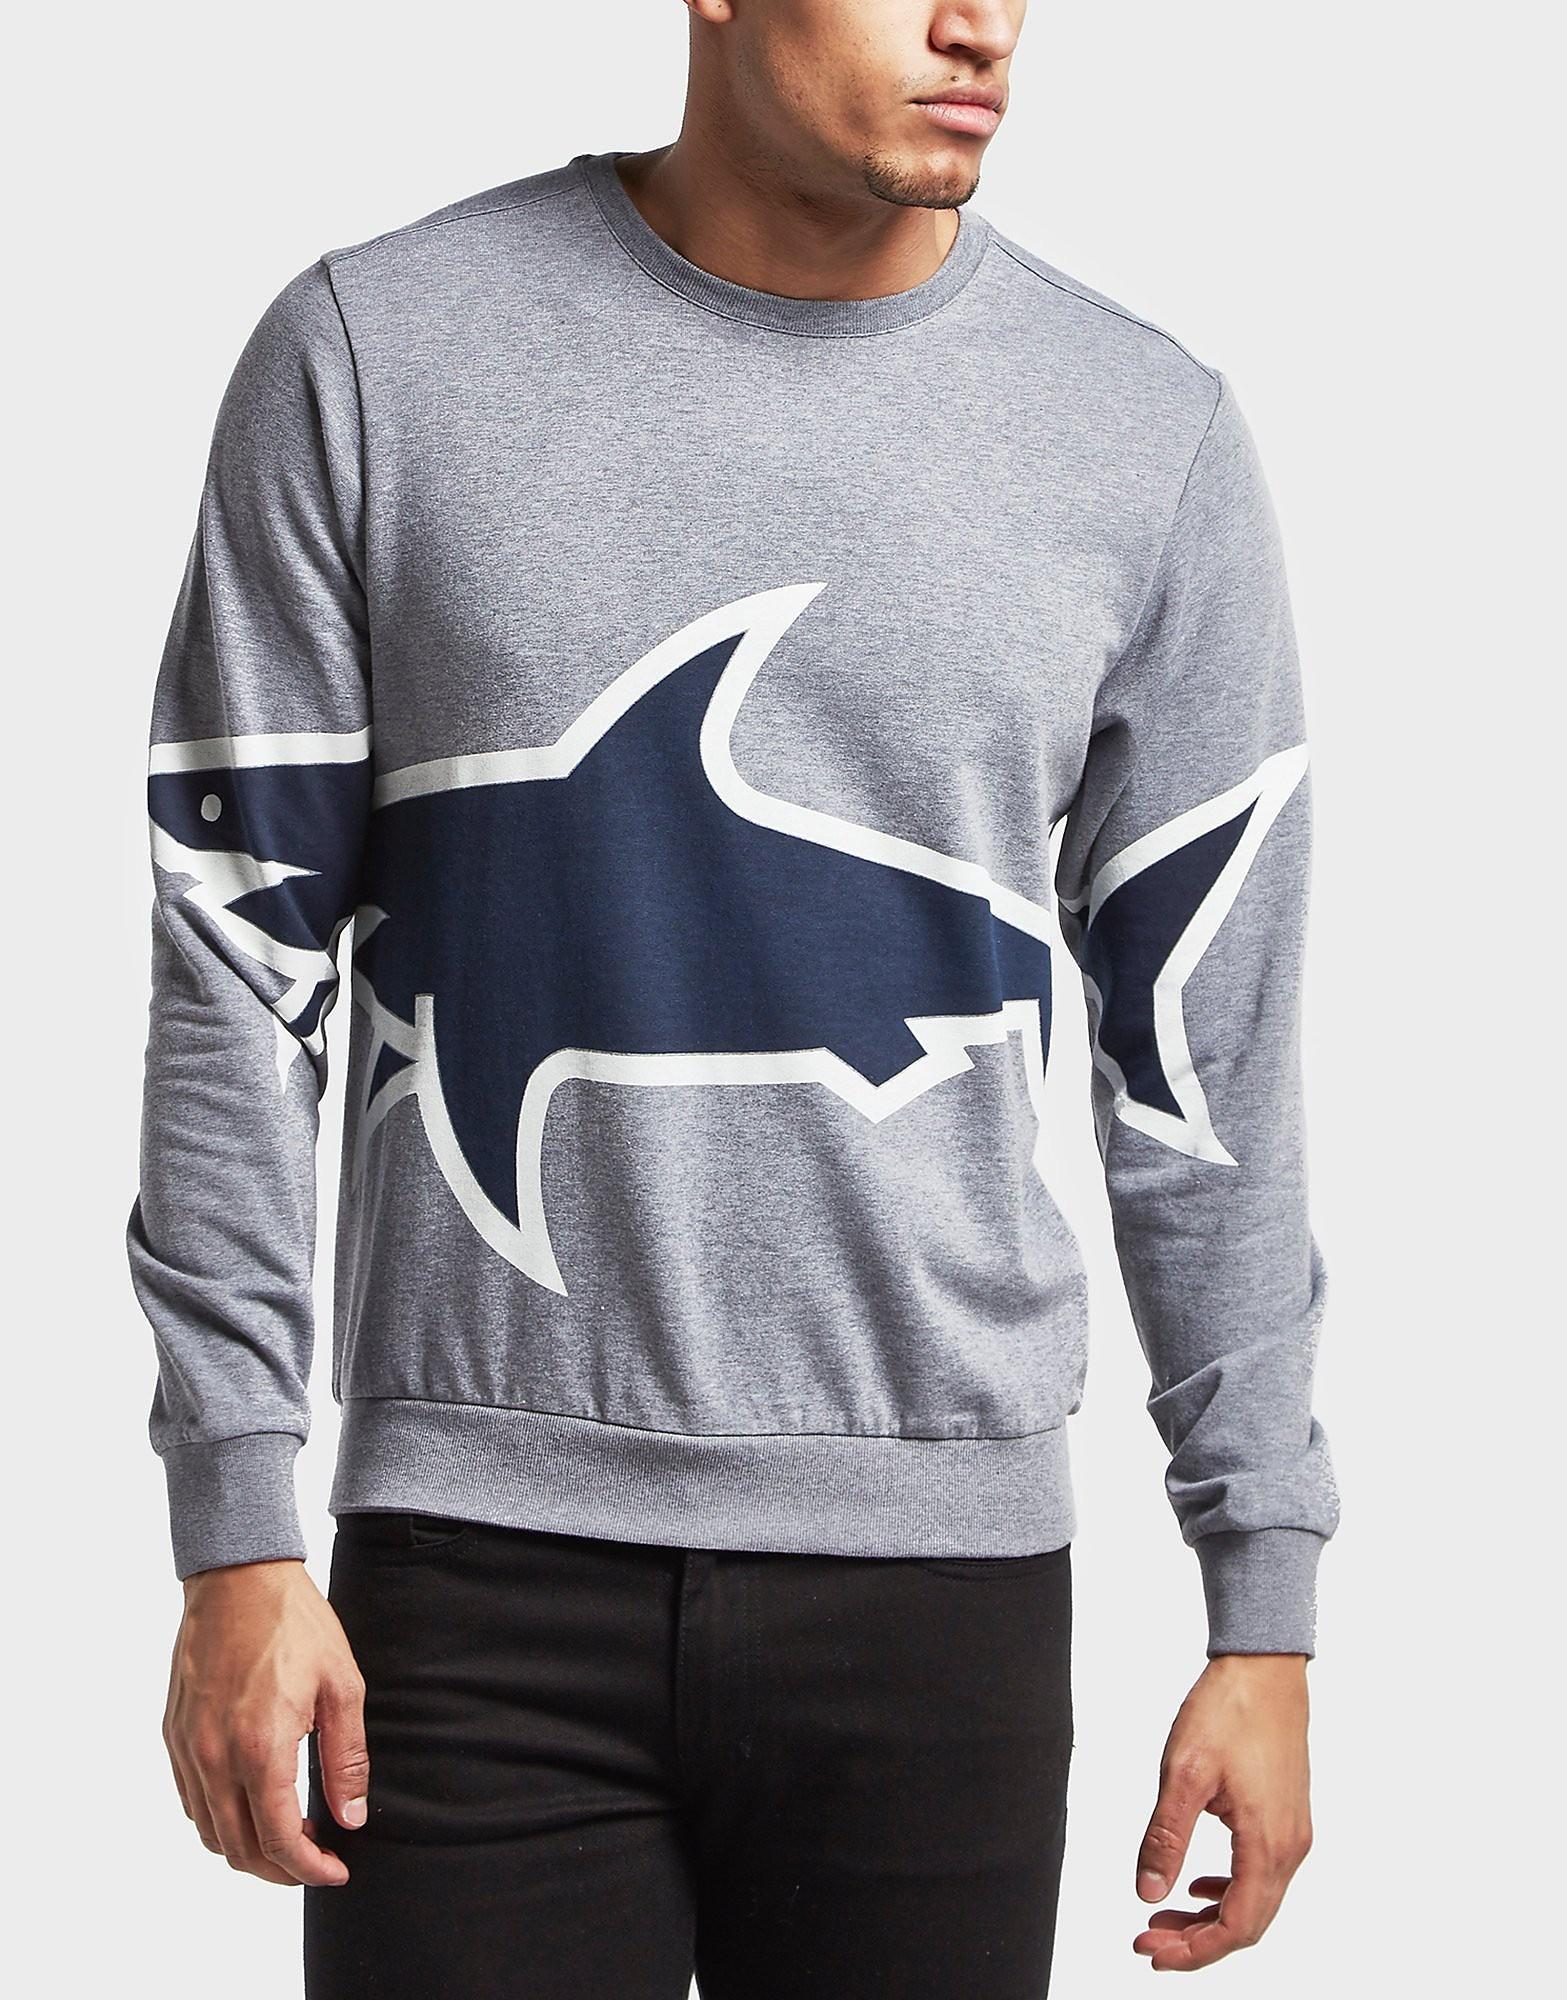 Paul and Shark Oversized Shark Sweatshirt